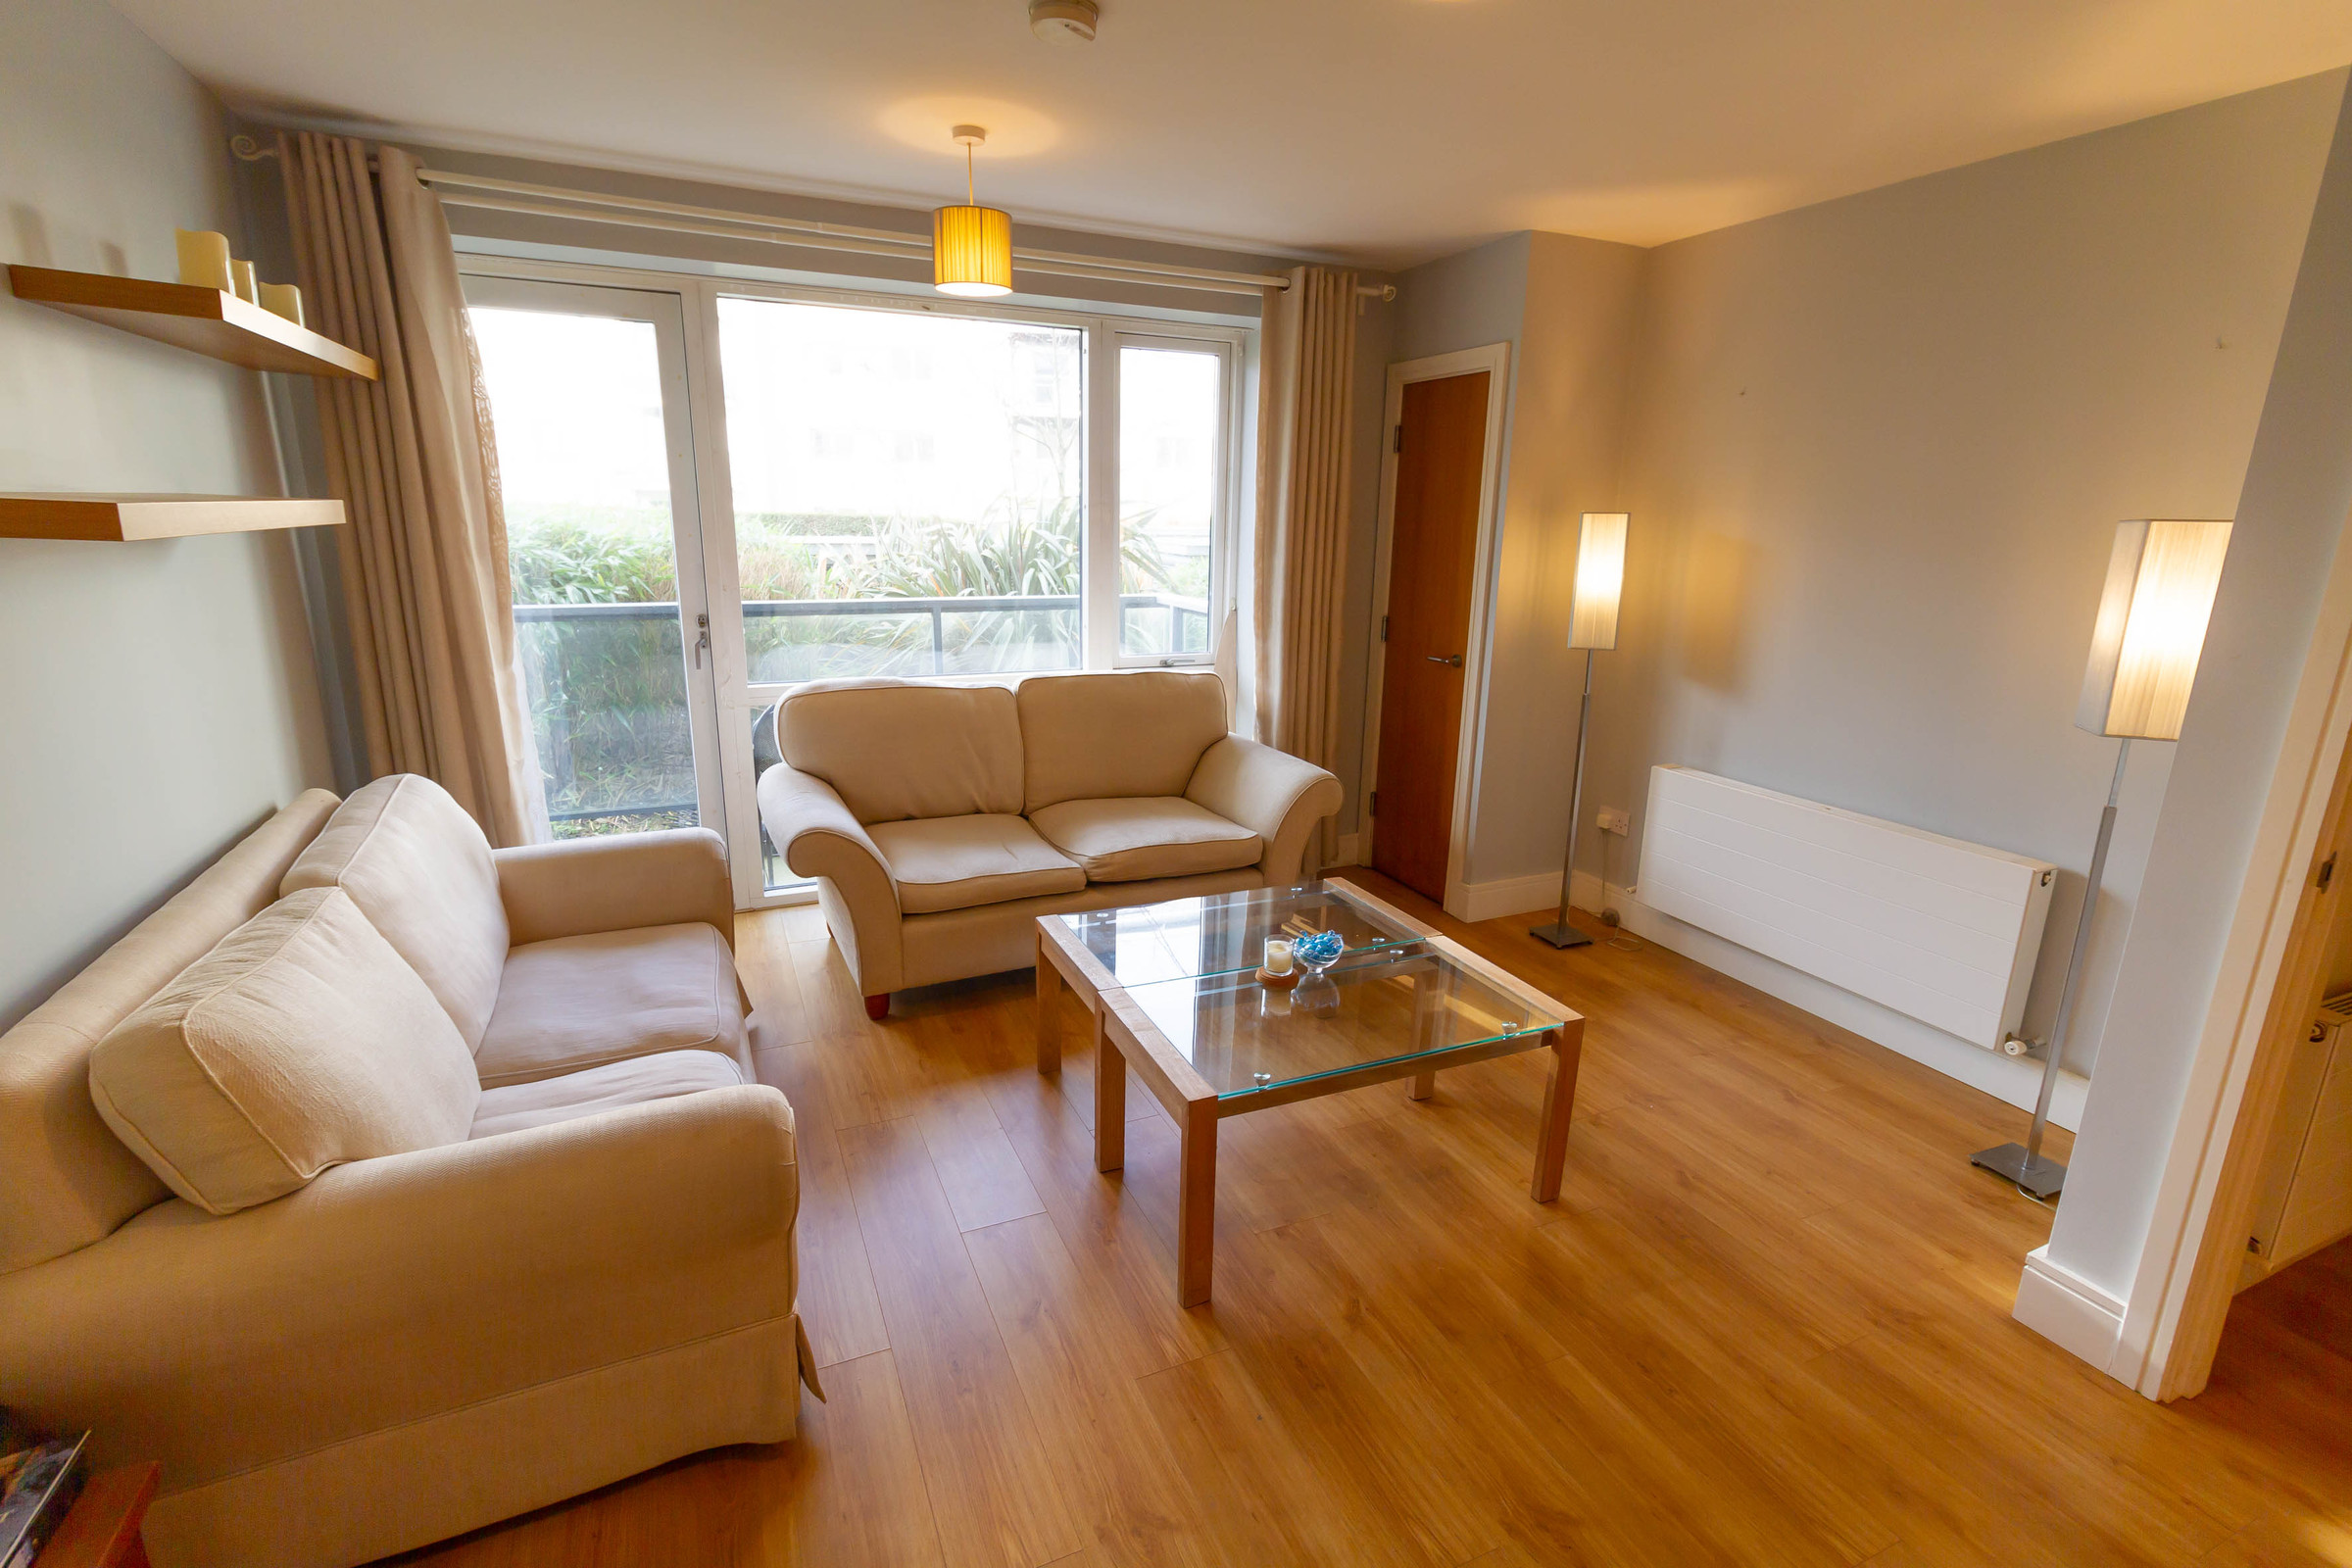 Apartment 36, Wyckham Point, Dundrum, Dublin 14